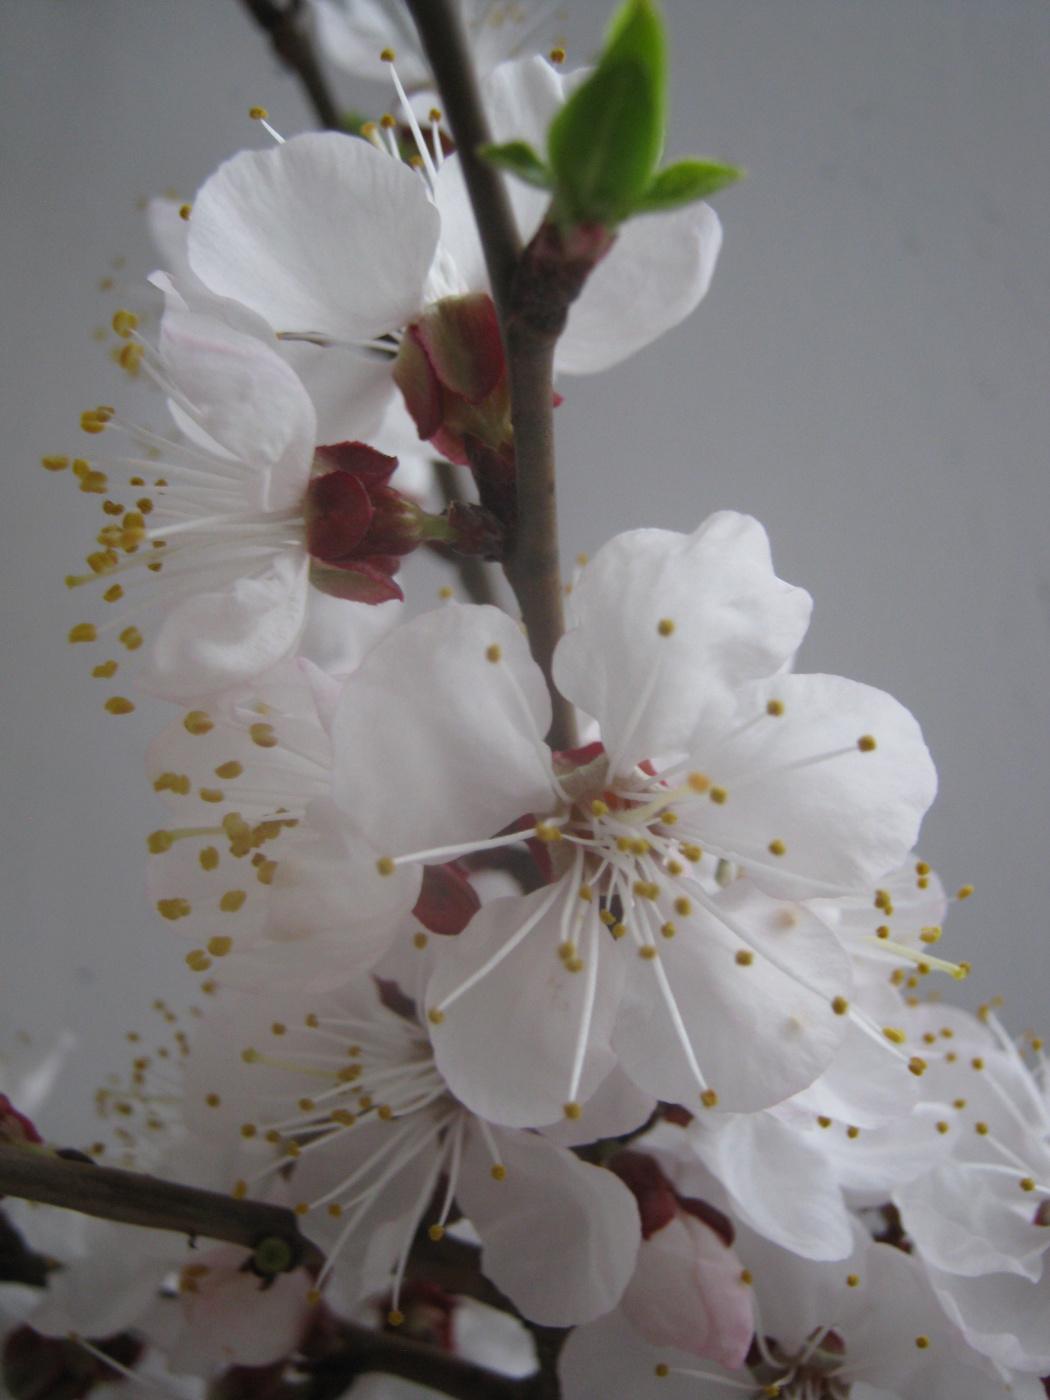 Алексей Гришанков (Alegri). Apricot blossom